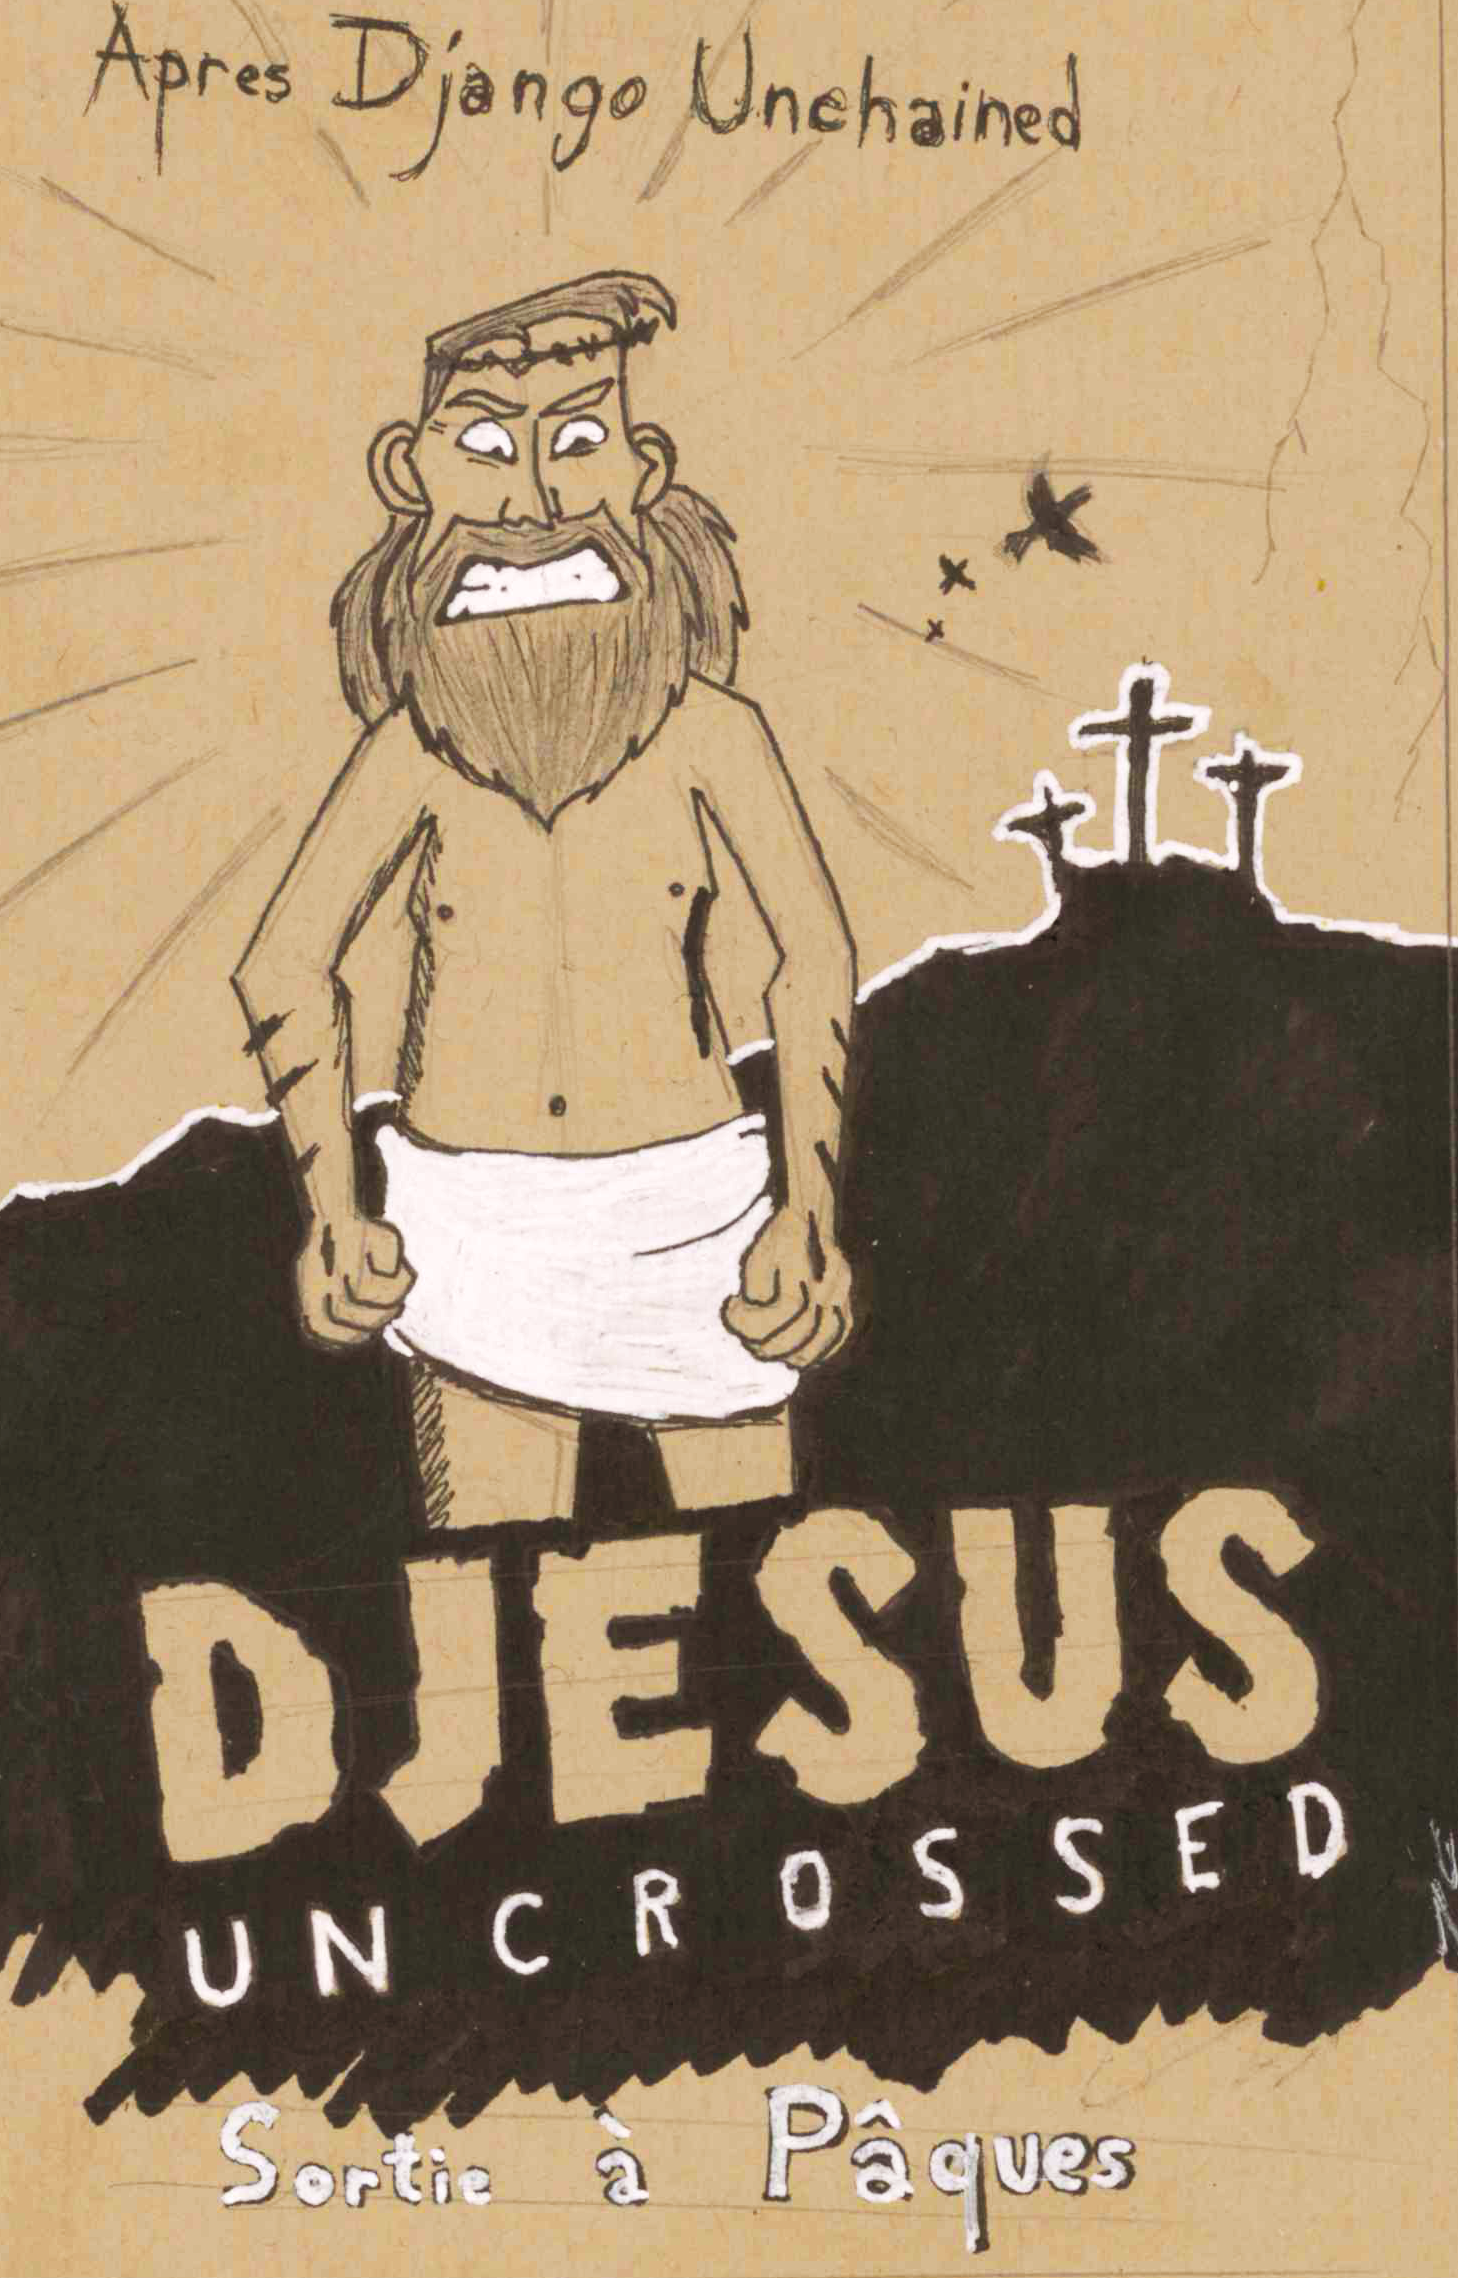 Djesus uncrossed